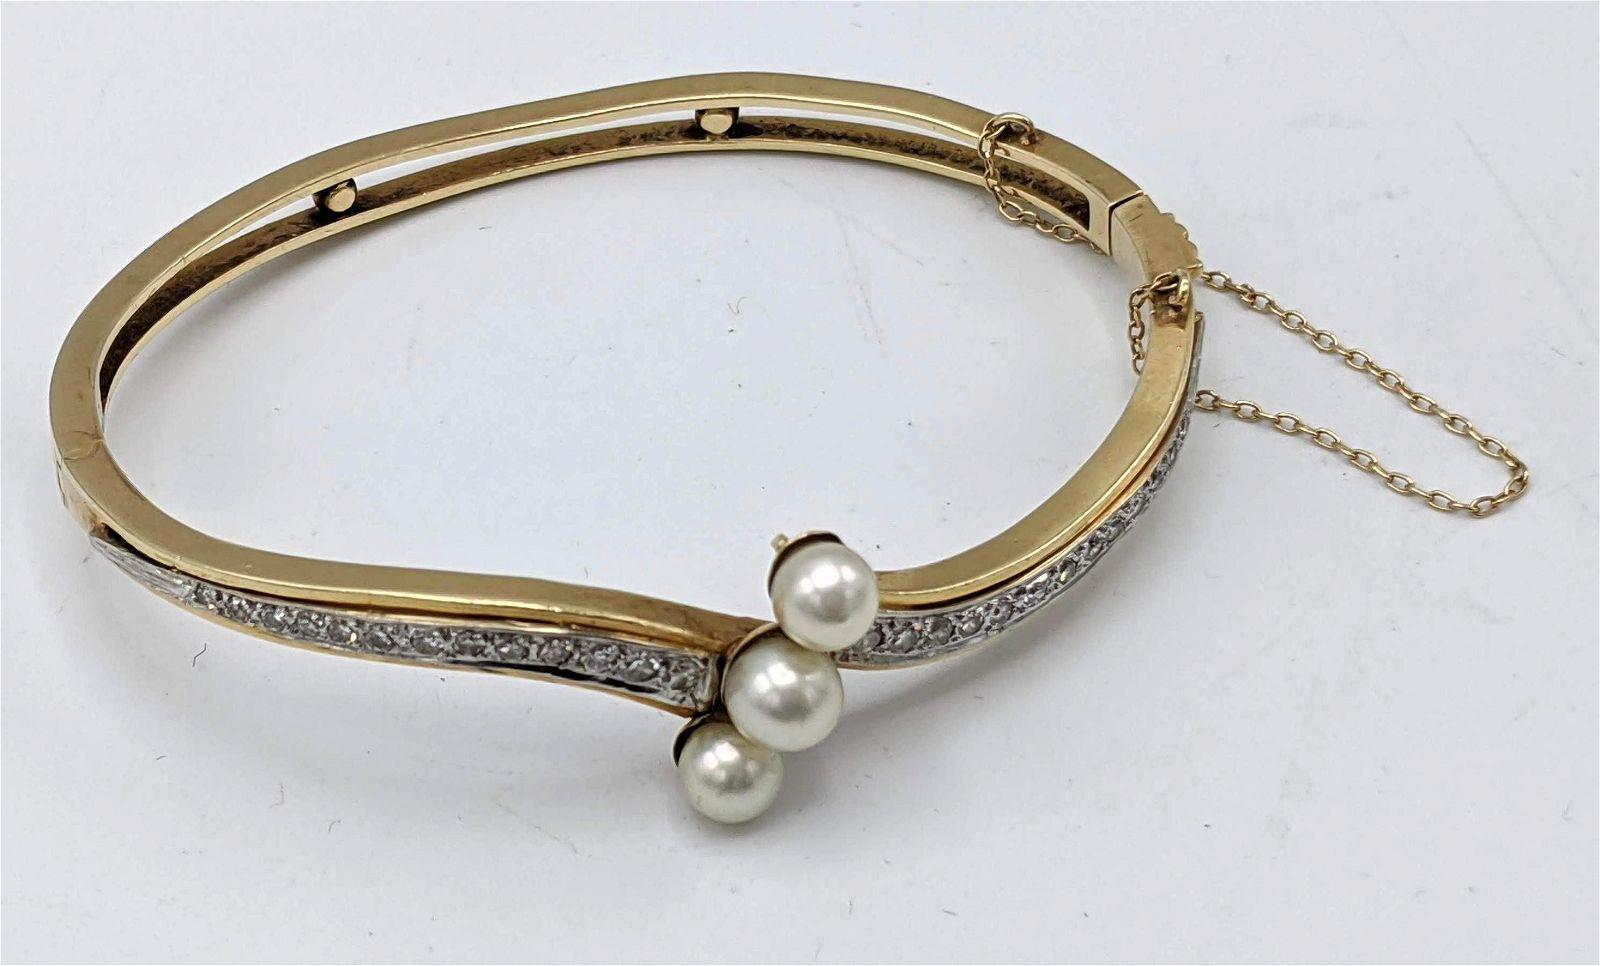 14k Gold Pearl and Diamond Hinged Bangle Bracelet. Yell